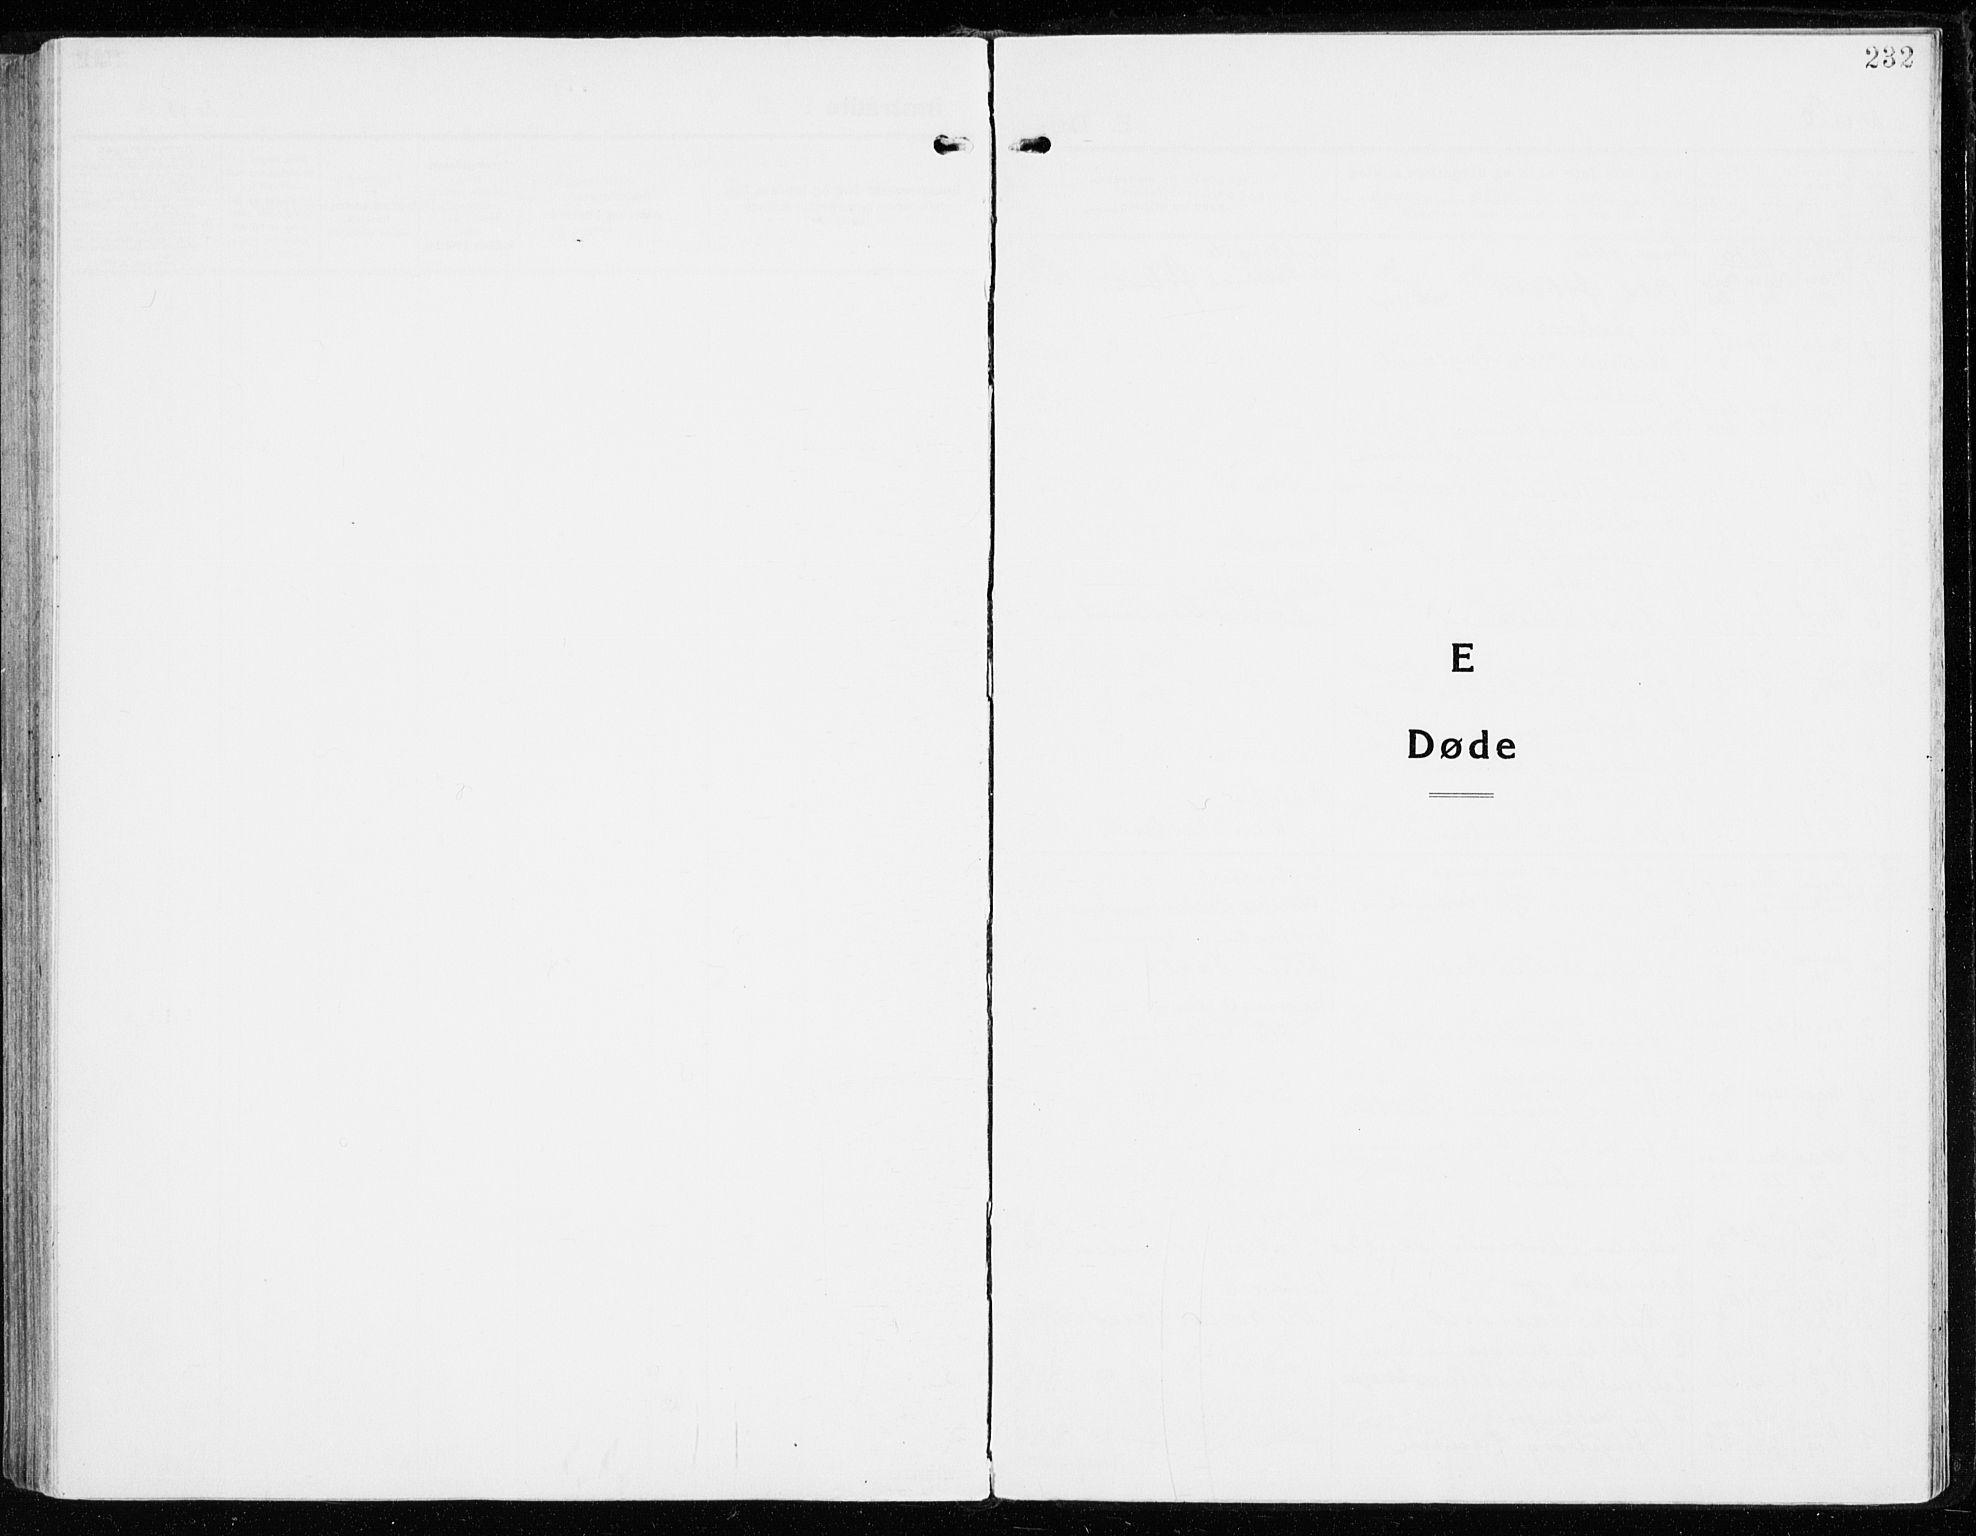 SAH, Vardal prestekontor, H/Ha/Haa/L0018: Ministerialbok nr. 18, 1930-1945, s. 232